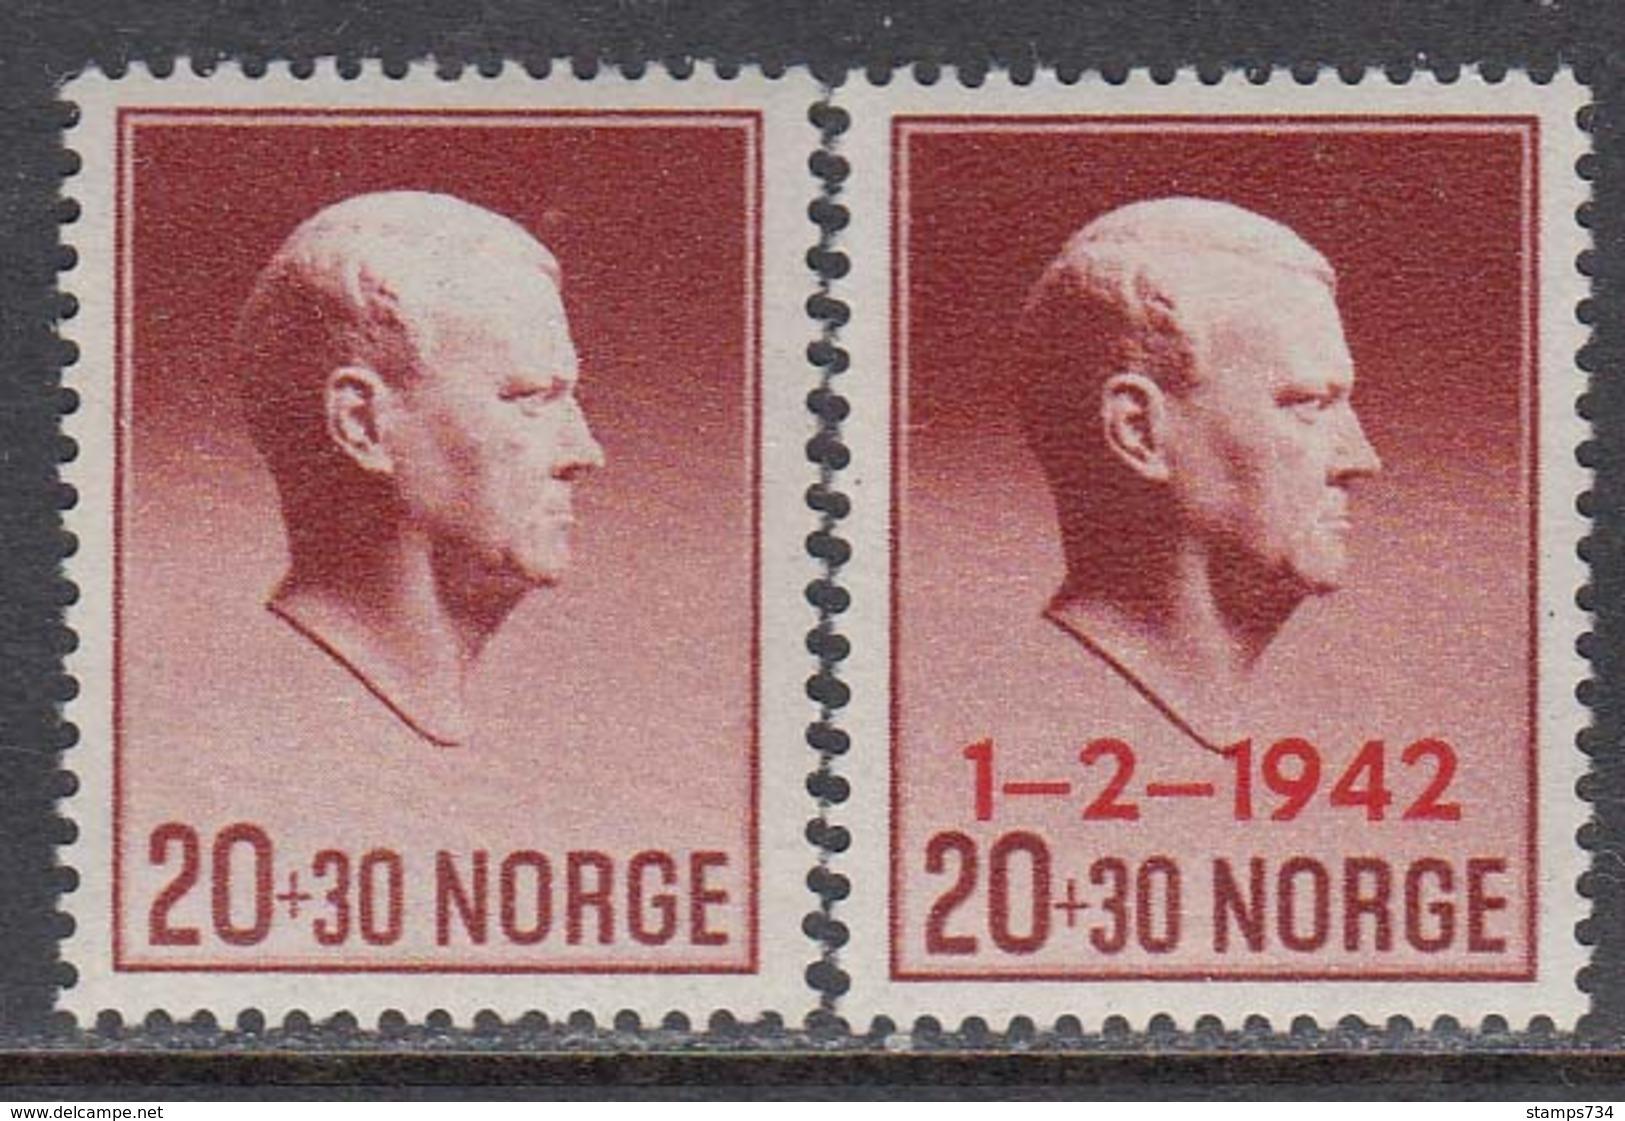 Norway 1942 - Hilfsfonds, Mi-Nr. 265/66, MNH** - Norvegia